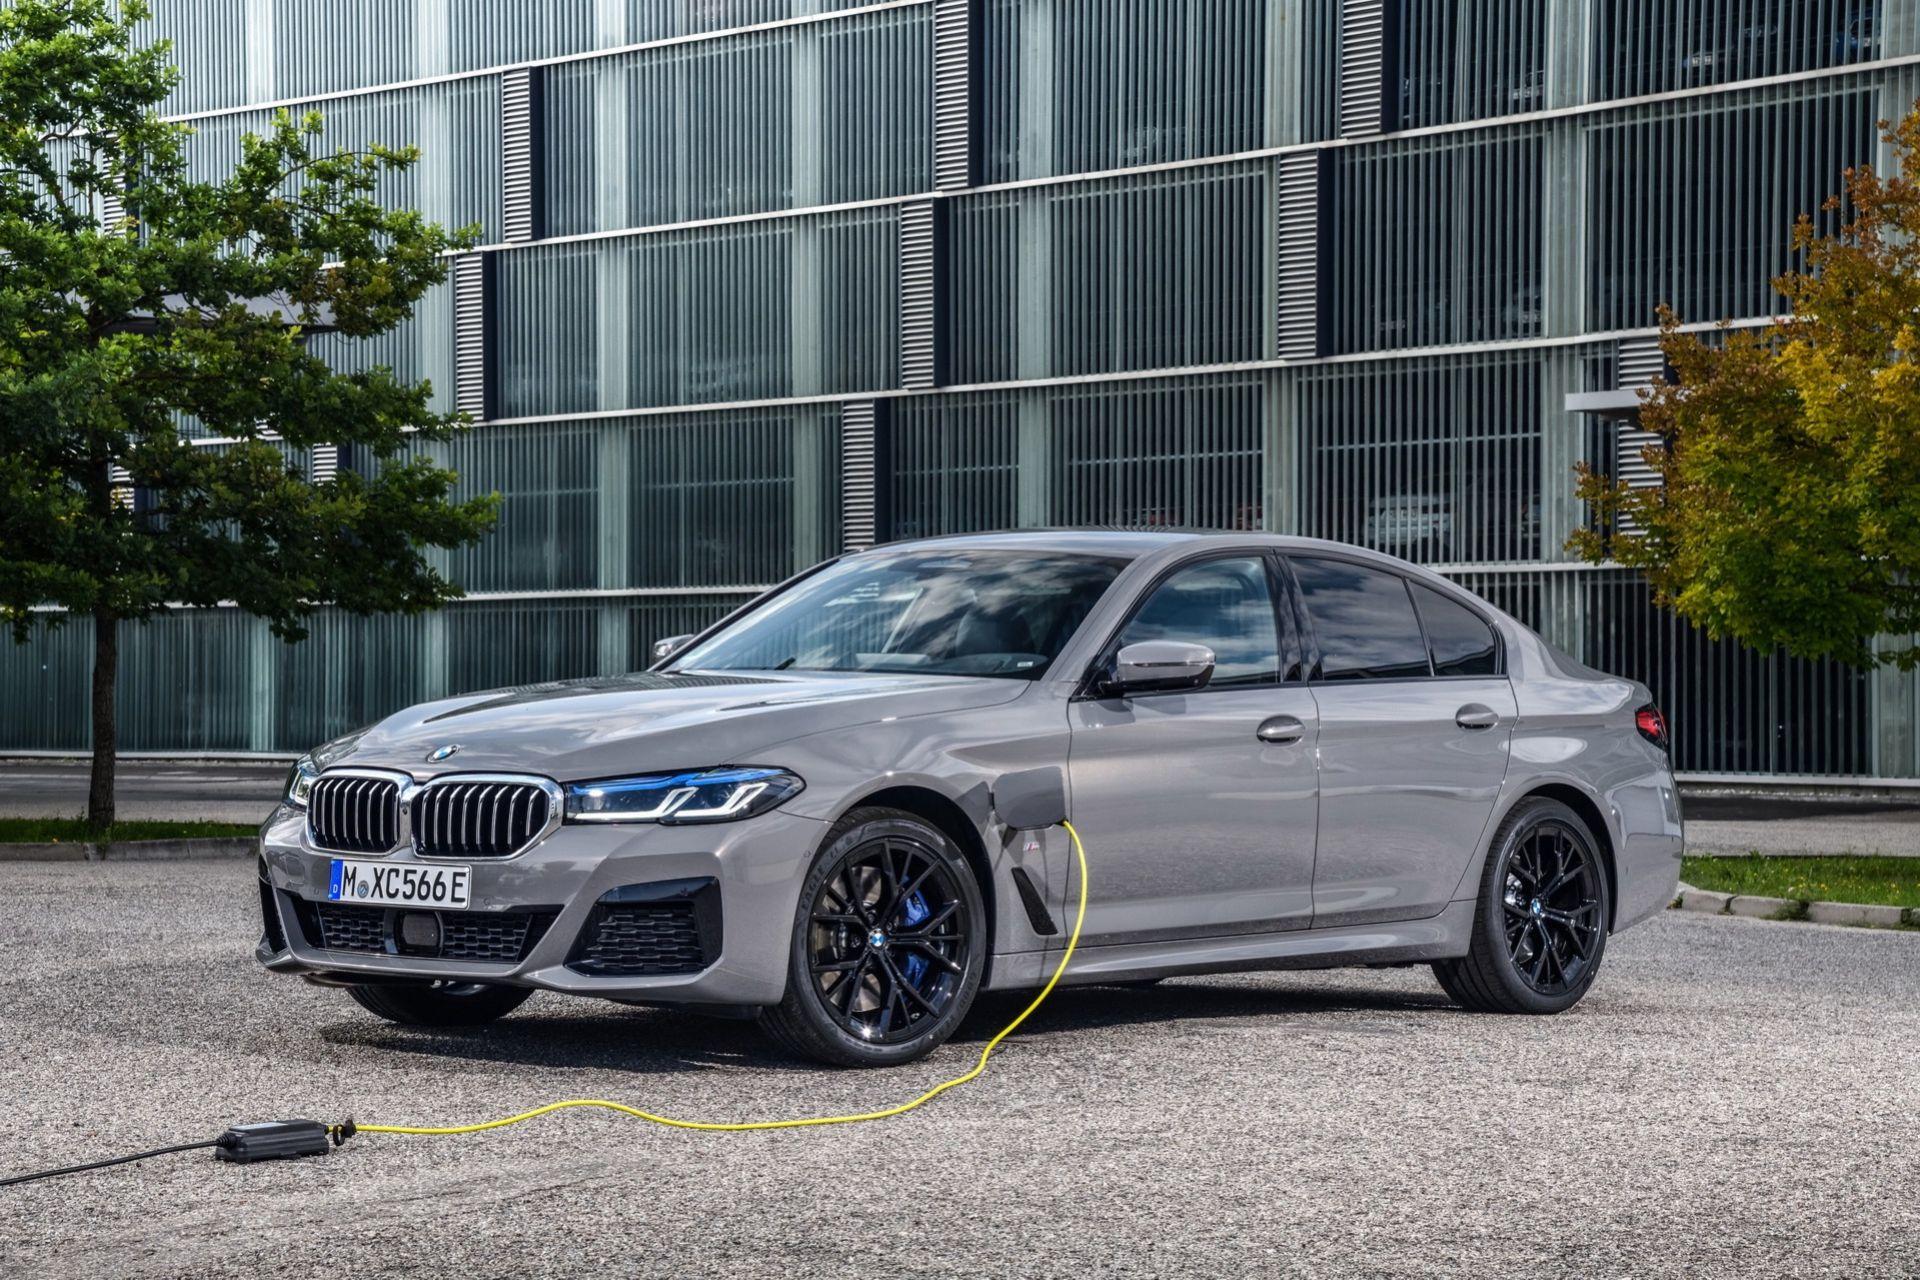 BMW 545e - laddhybrid med sexa